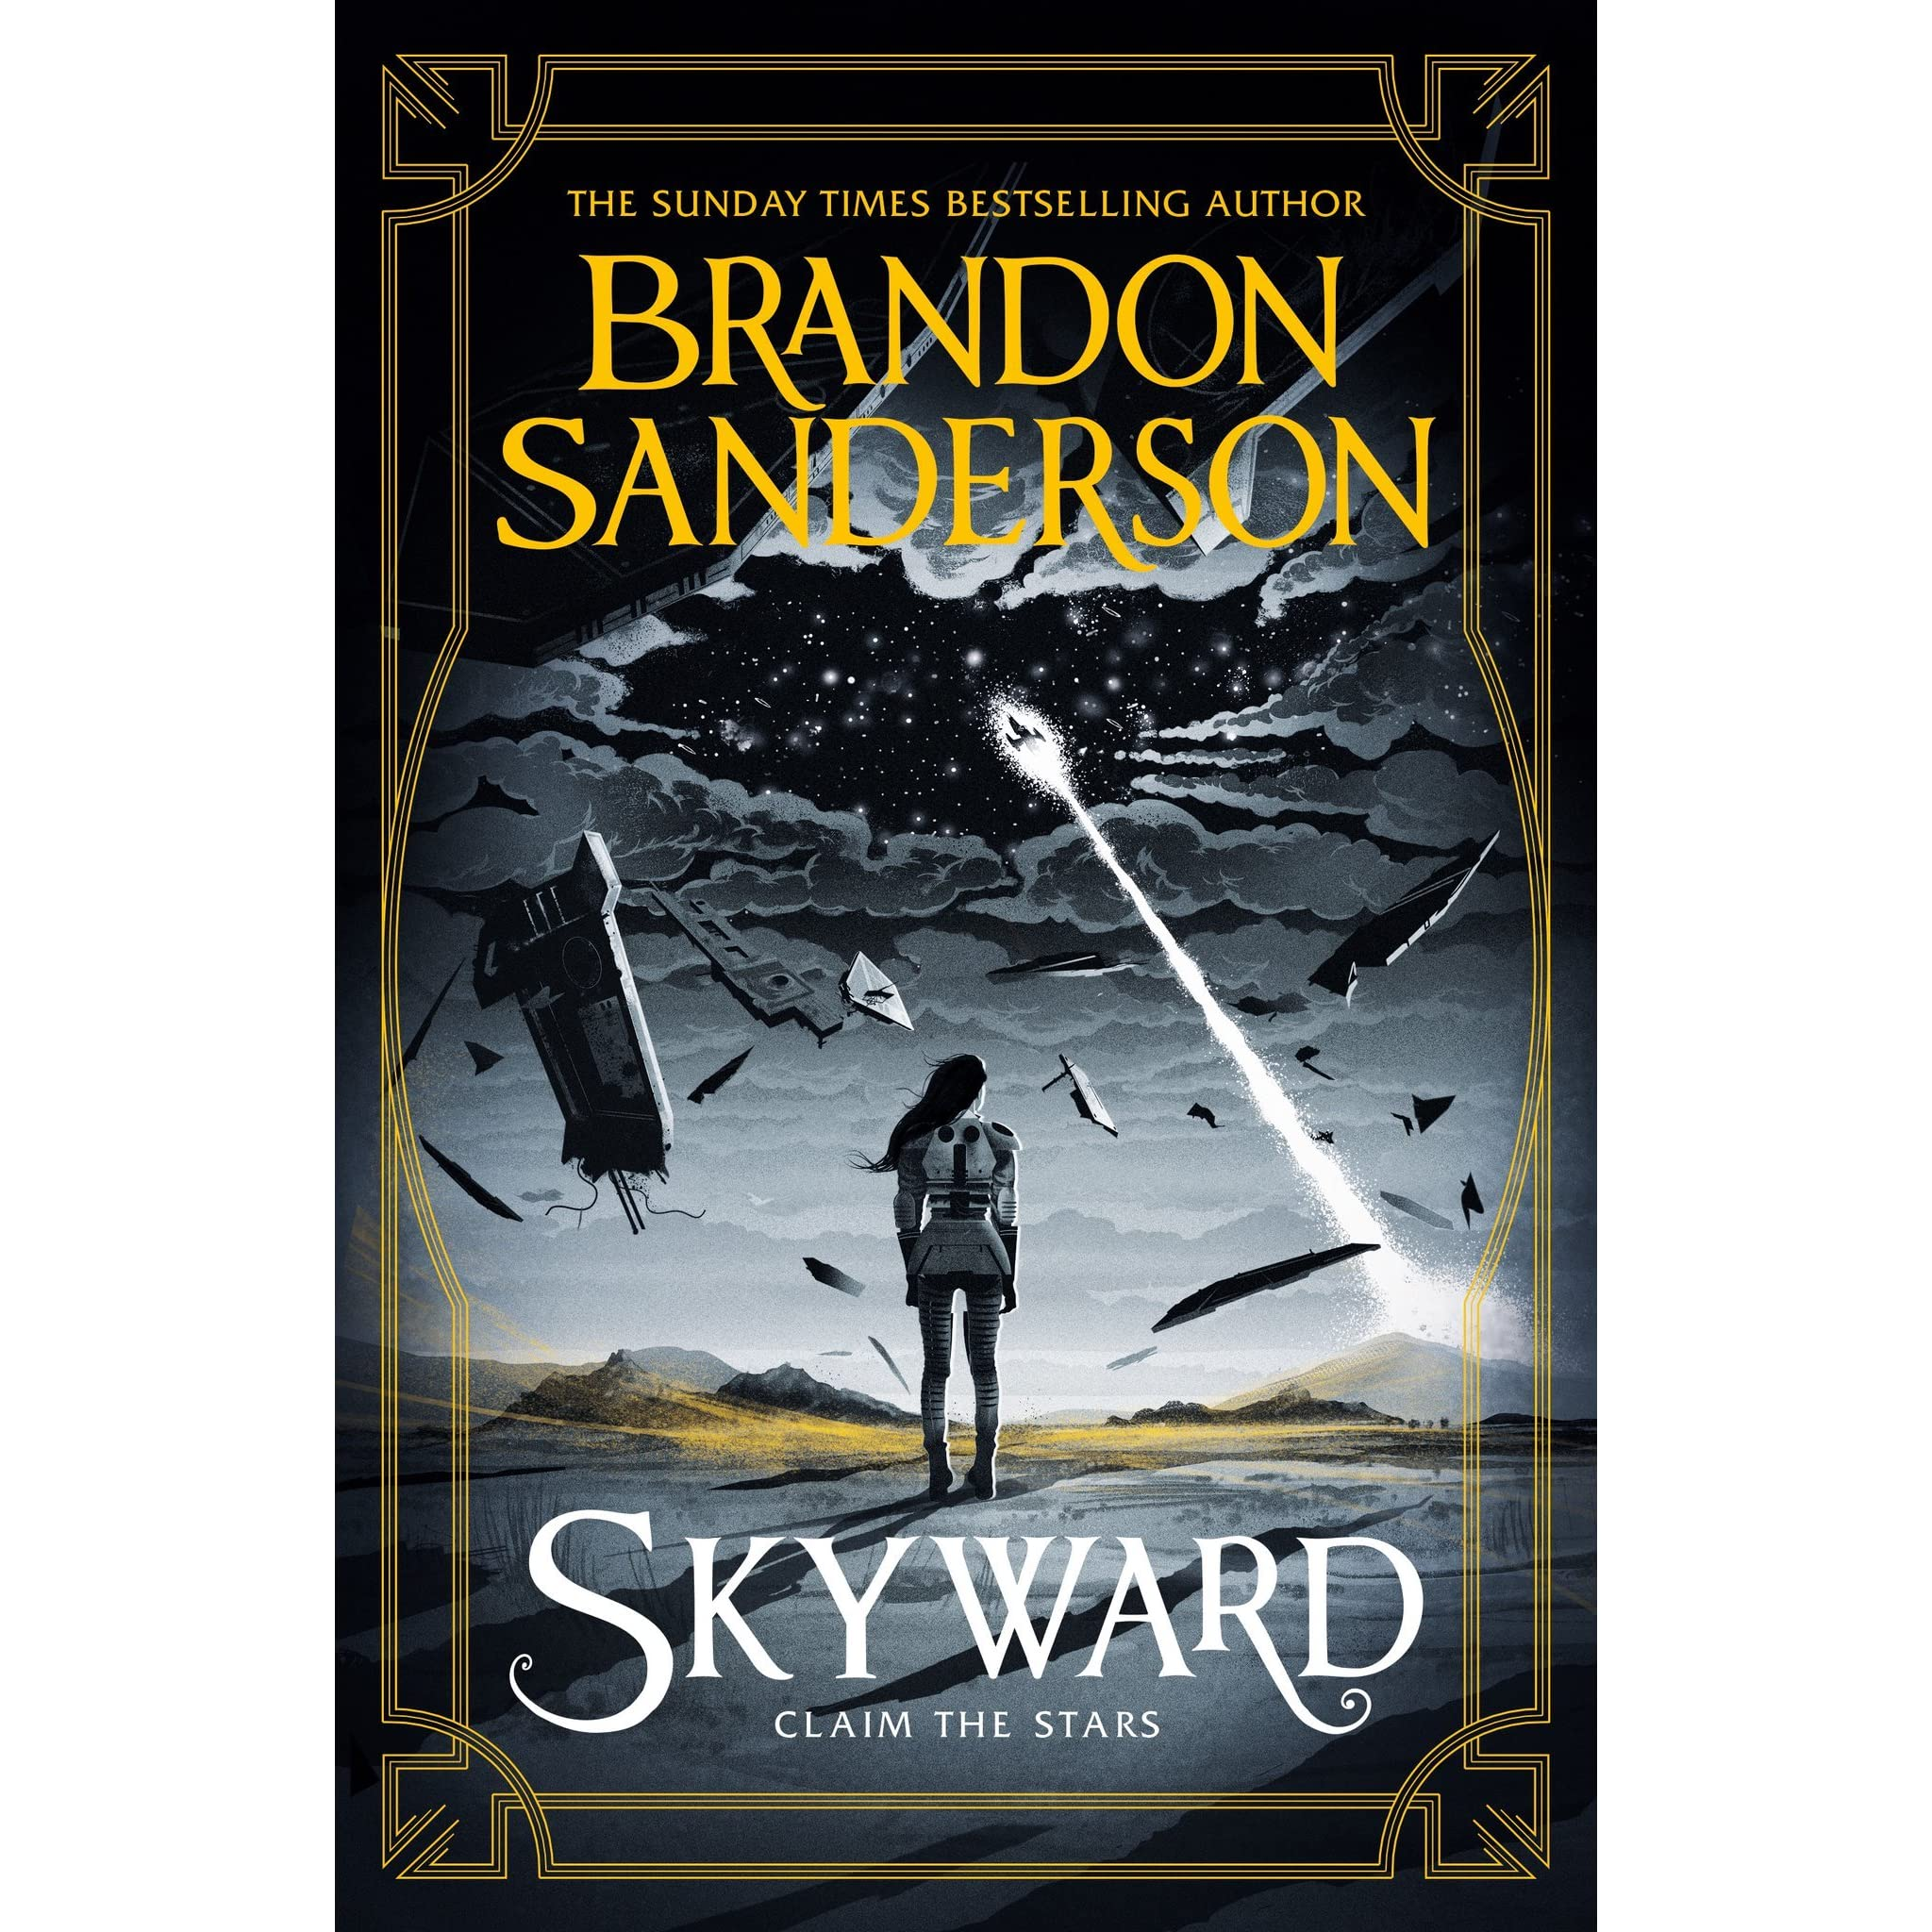 skyward (skyward, #1) by brandon sanderson